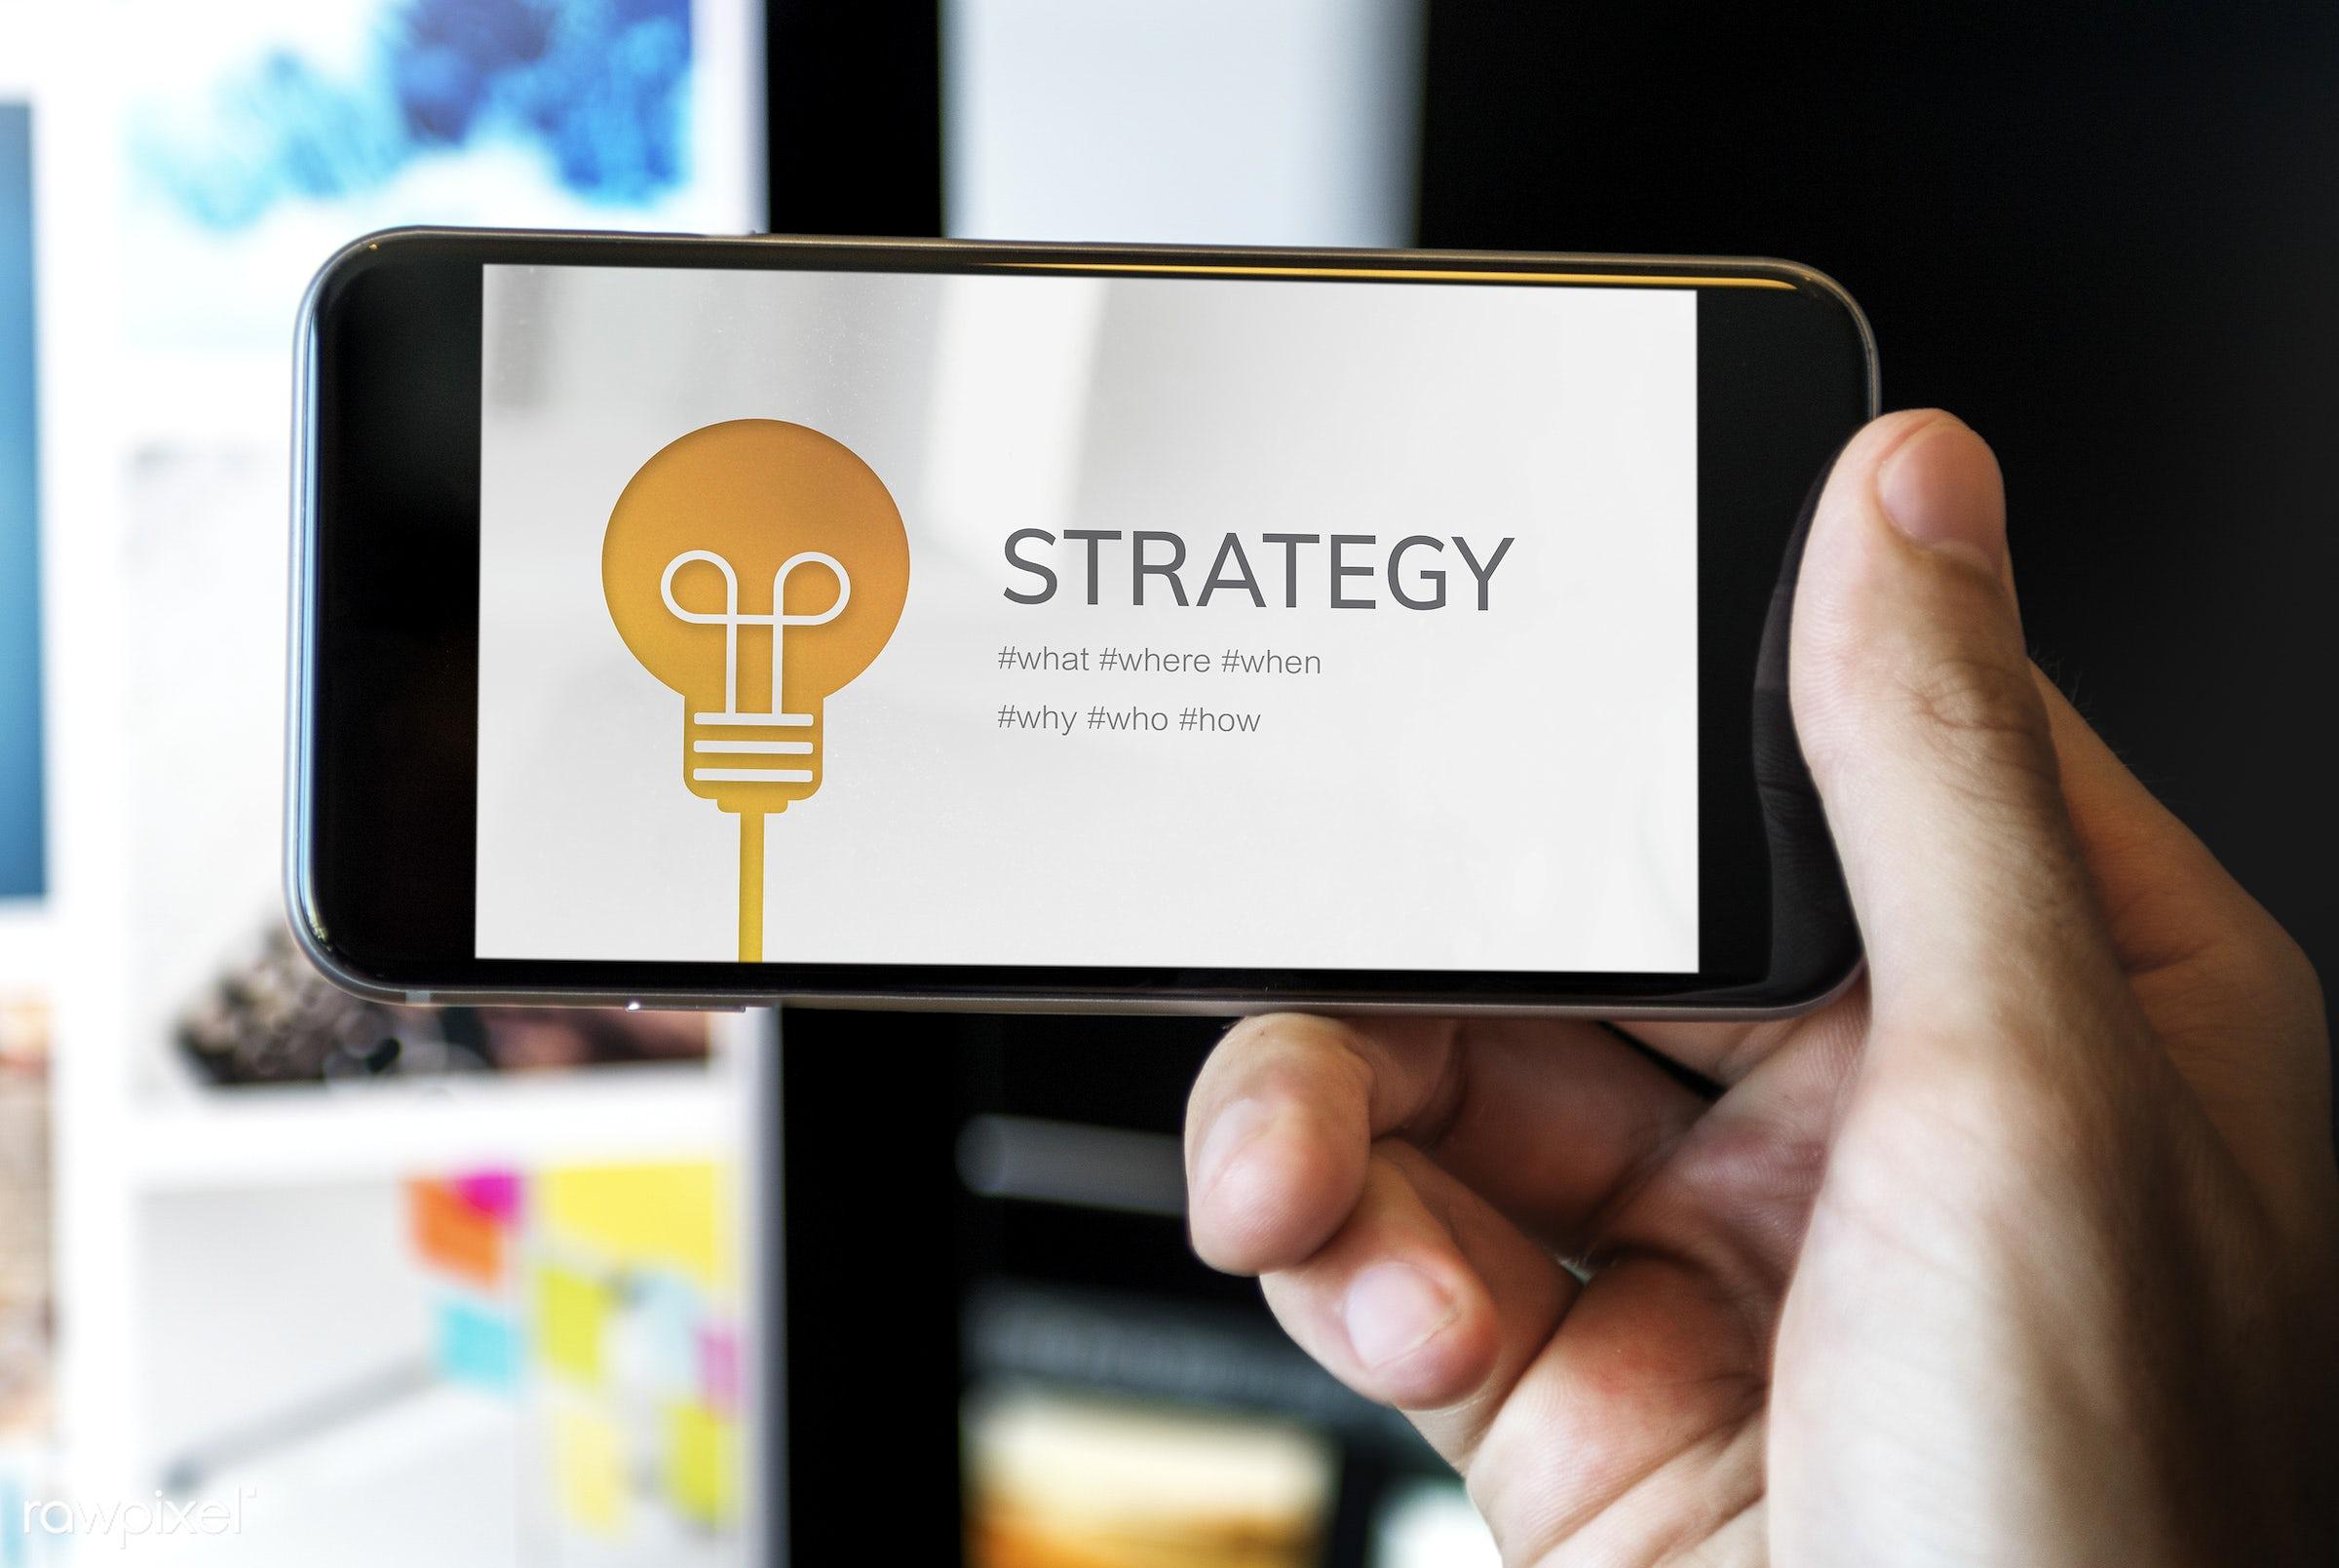 strategic, blog, browsing, communication, connect, development, digital device, guidelines, man, media, mission, mobile,...